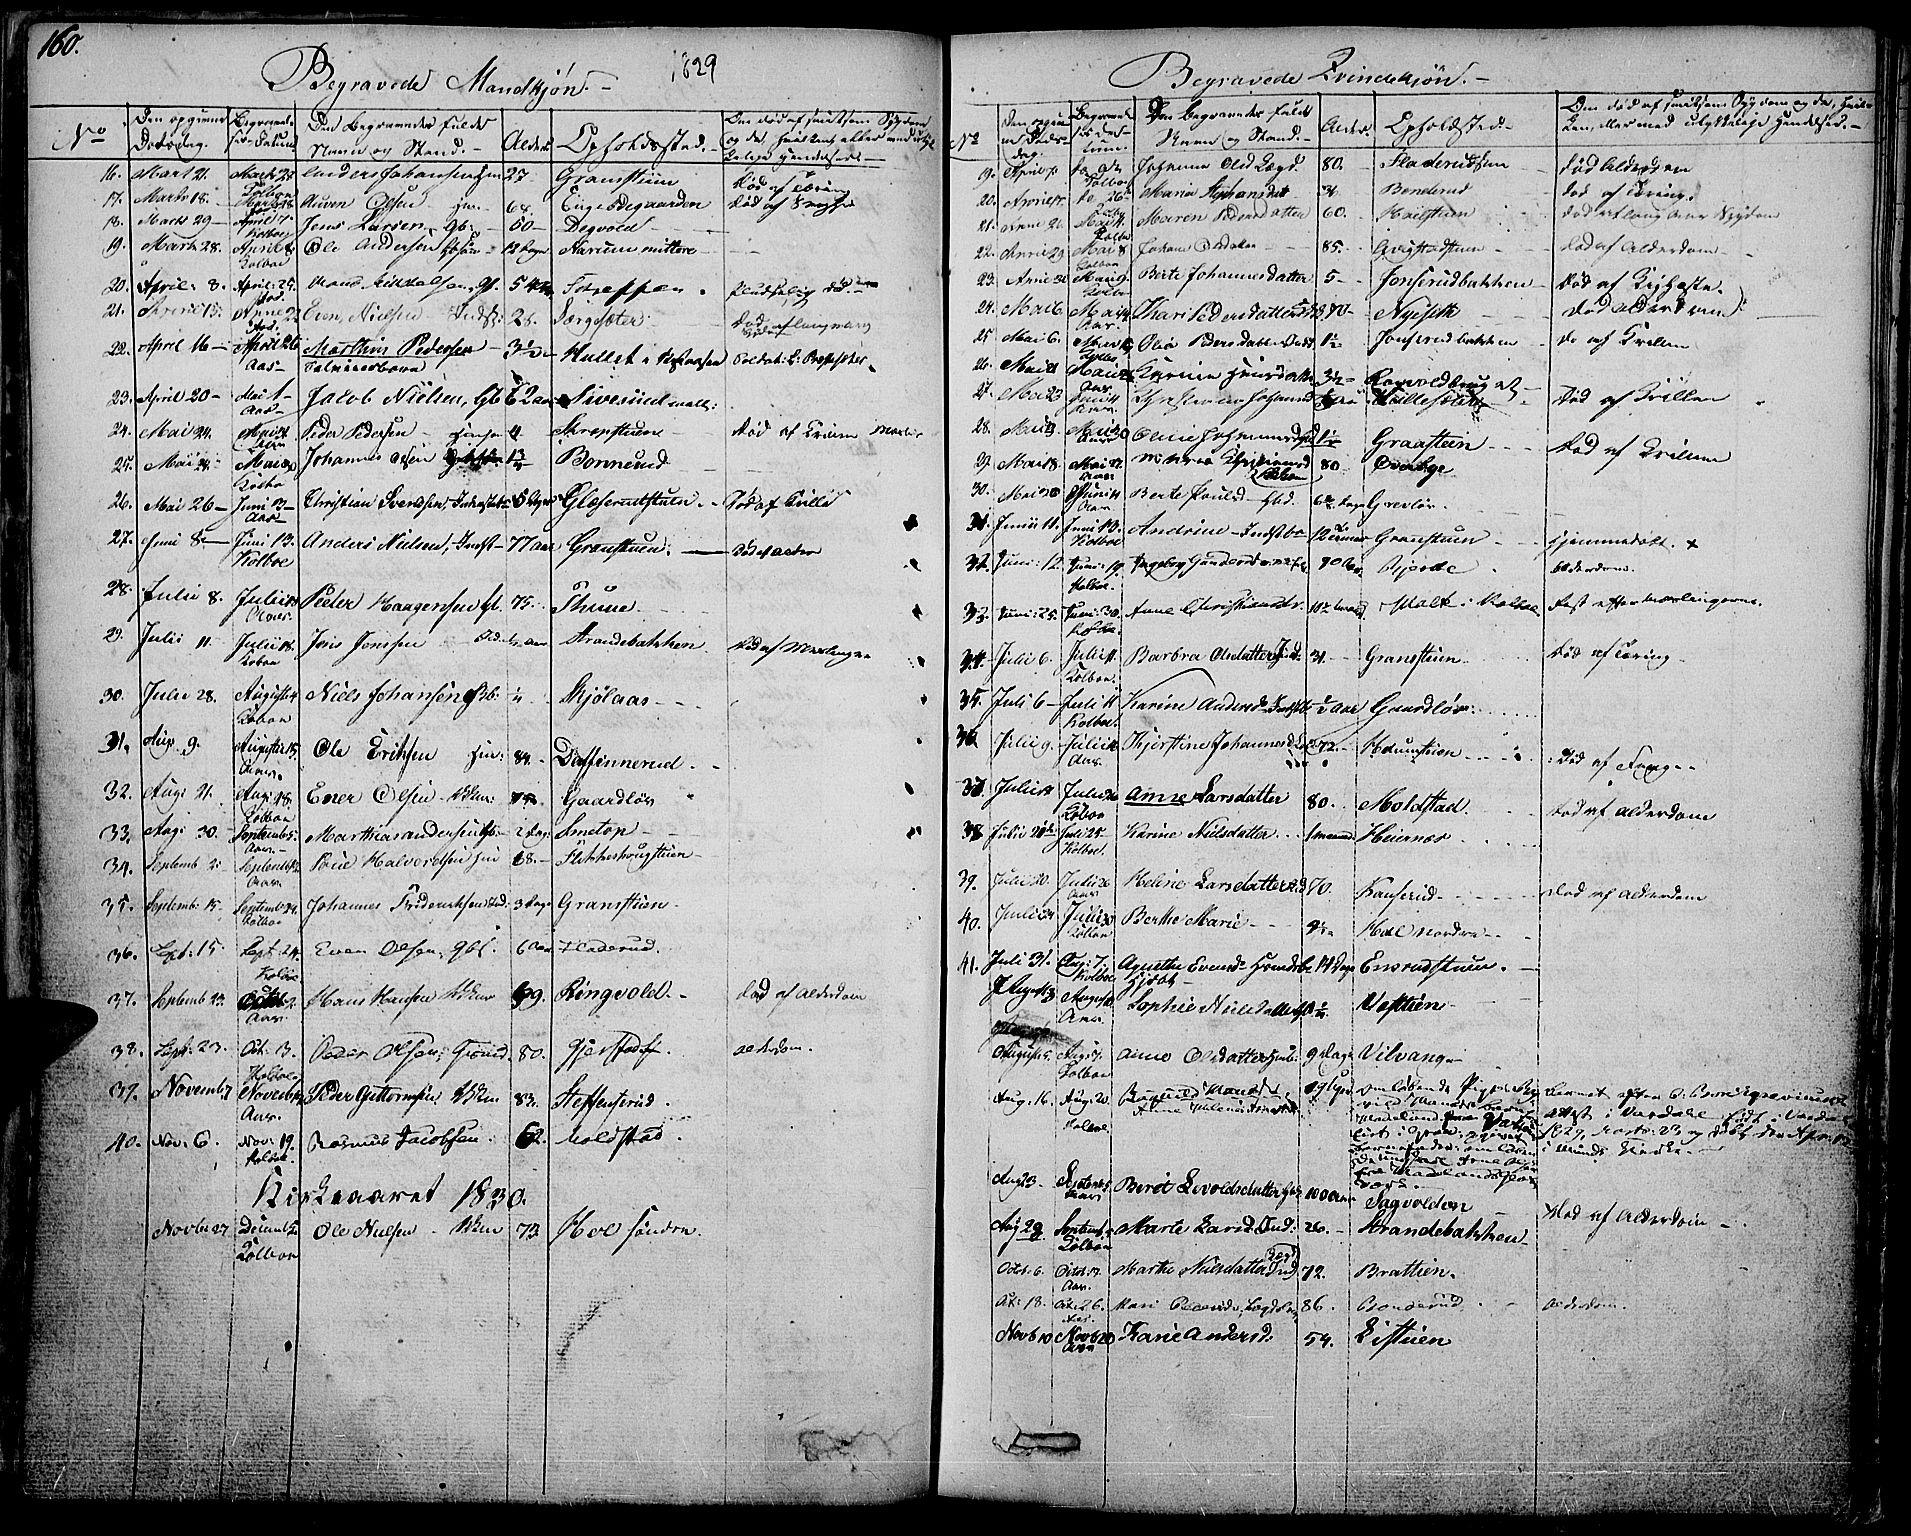 SAH, Vestre Toten prestekontor, H/Ha/Haa/L0002: Ministerialbok nr. 2, 1825-1837, s. 160